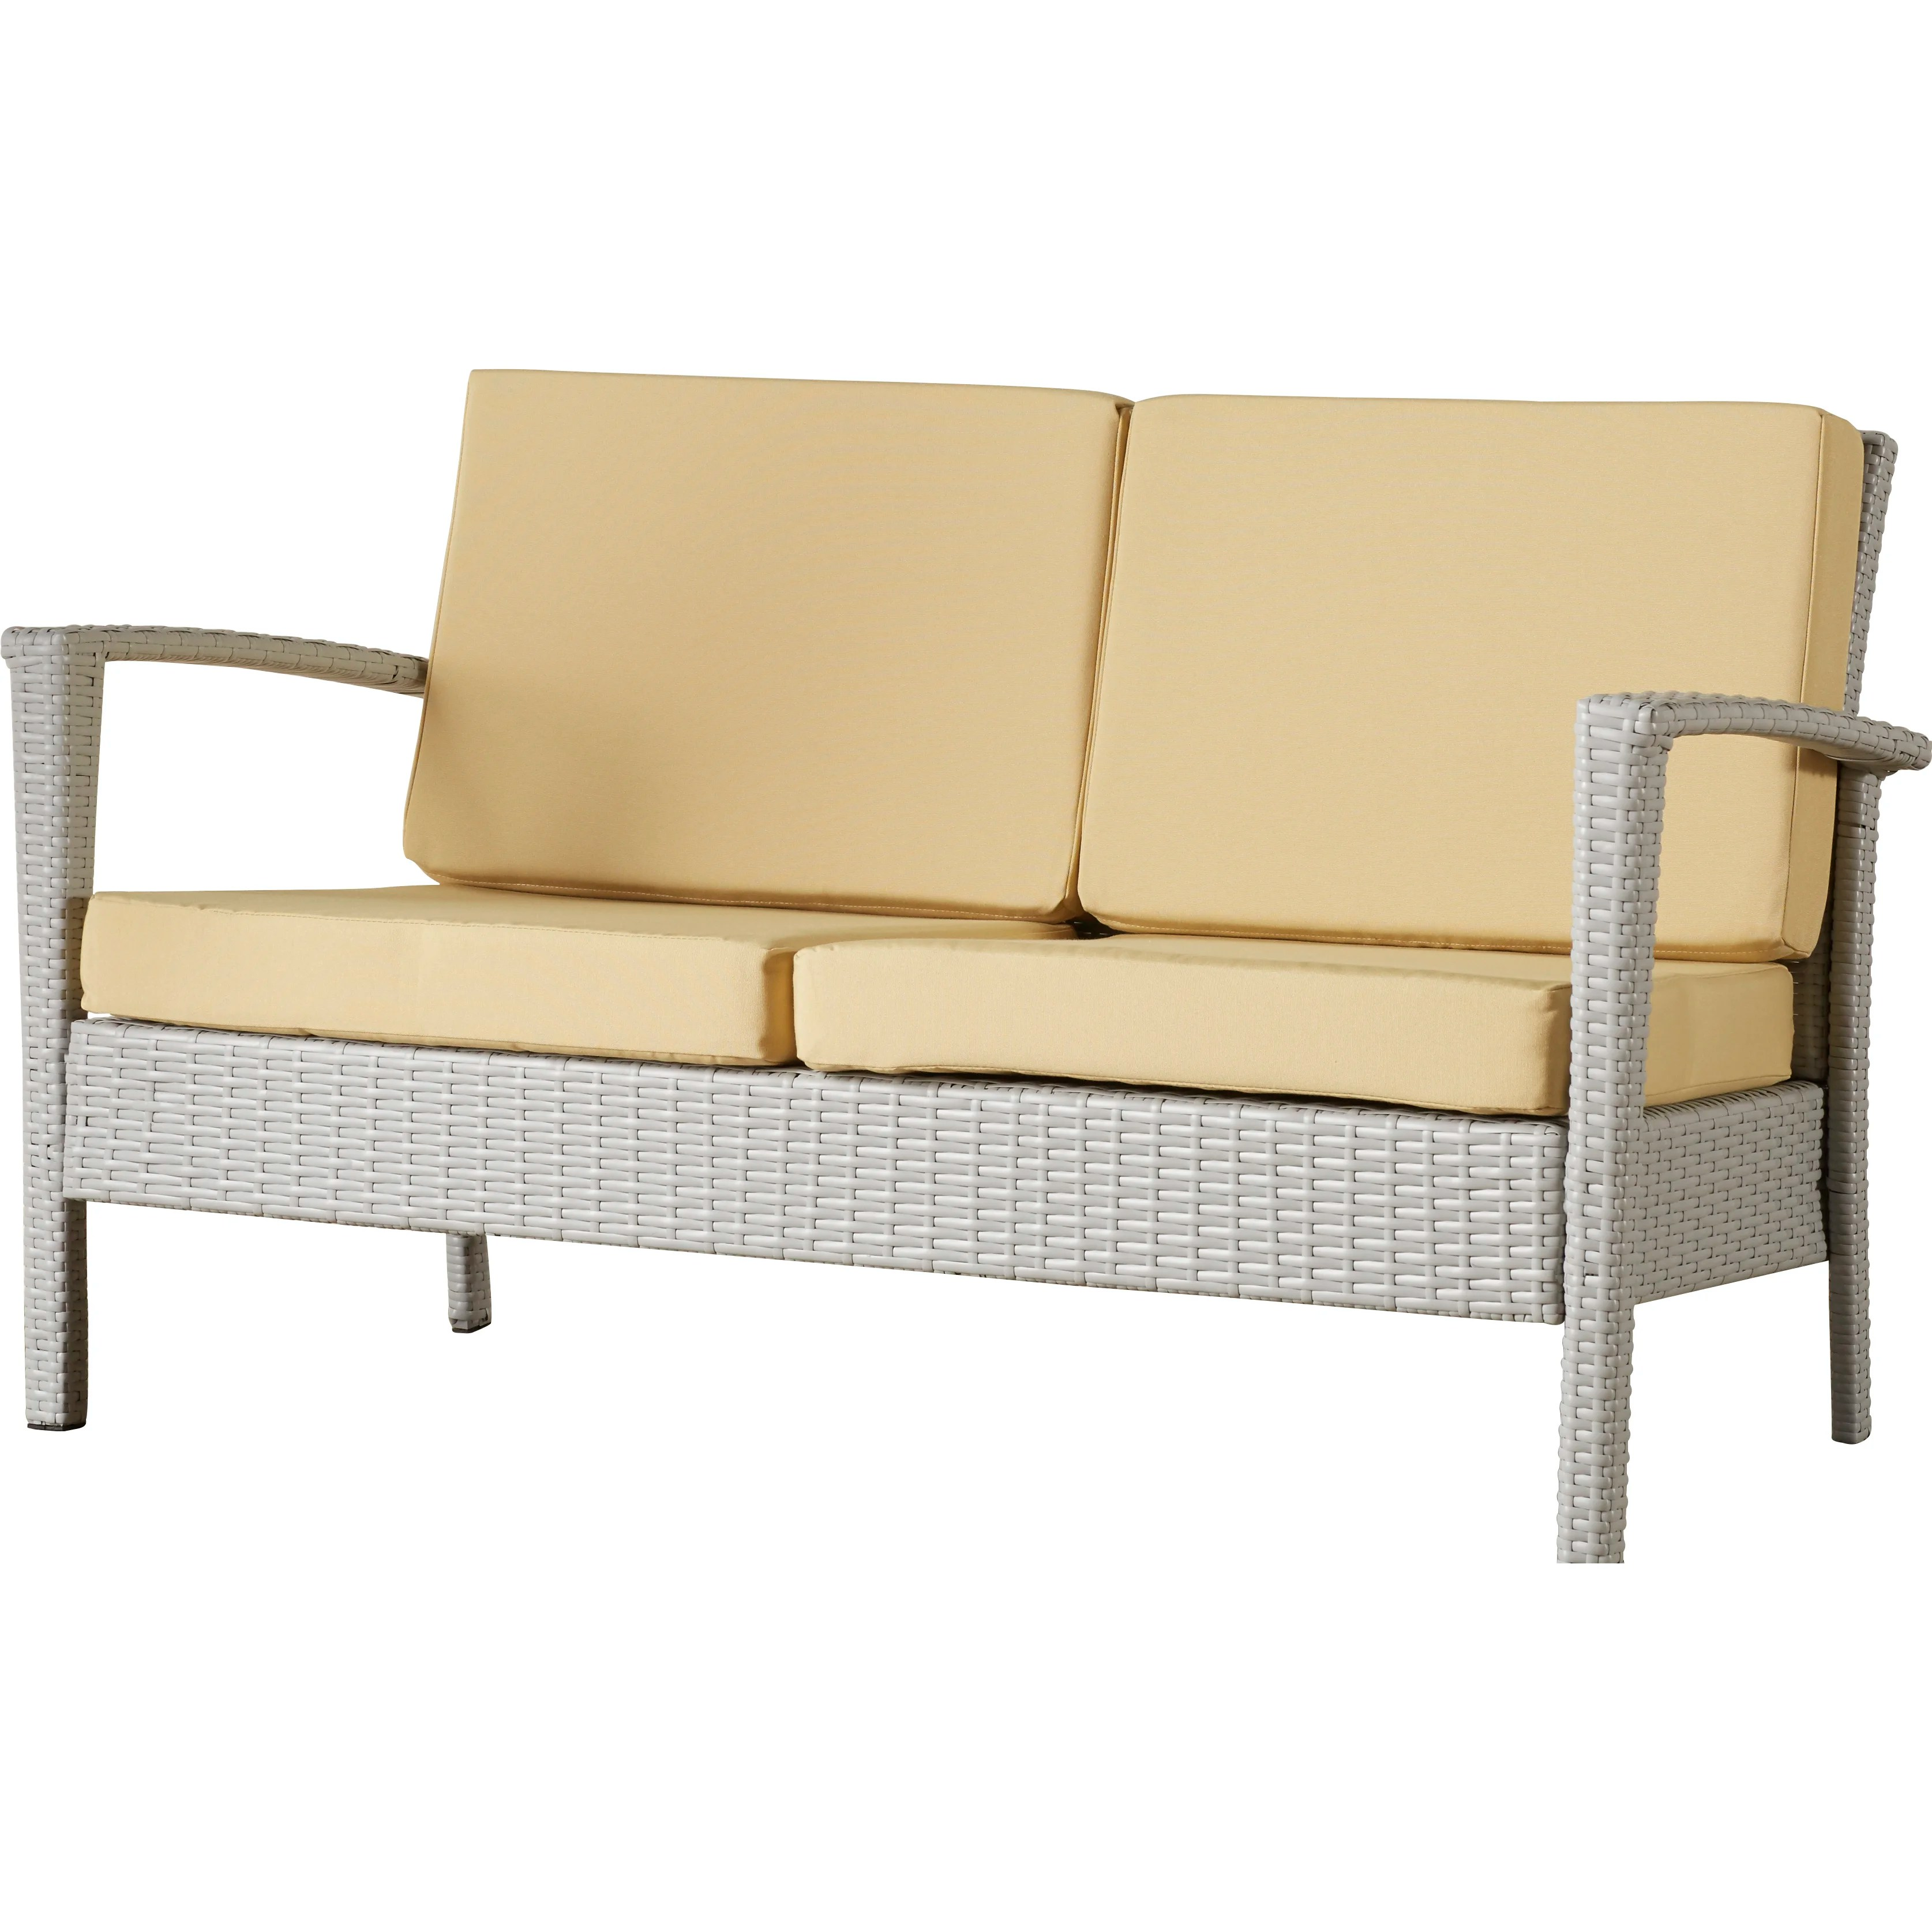 1 piece patio chair cushions wedding covers wholesale canada brayden studio piscataway 4 outdoor dining